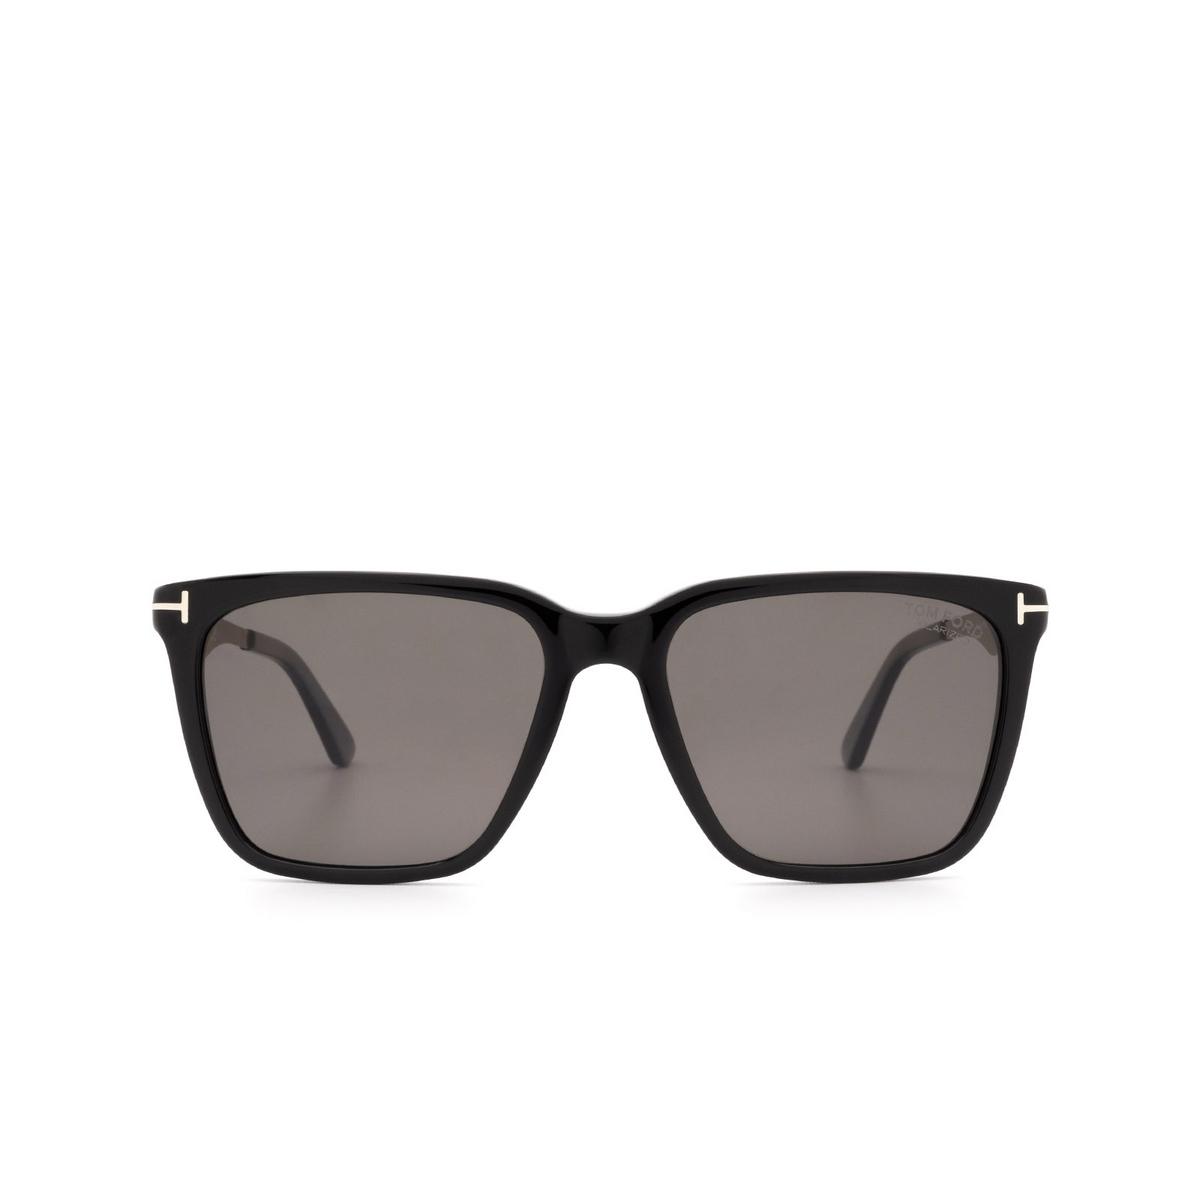 Tom Ford® Square Sunglasses: Garret FT0862 color Black 01D - front view.